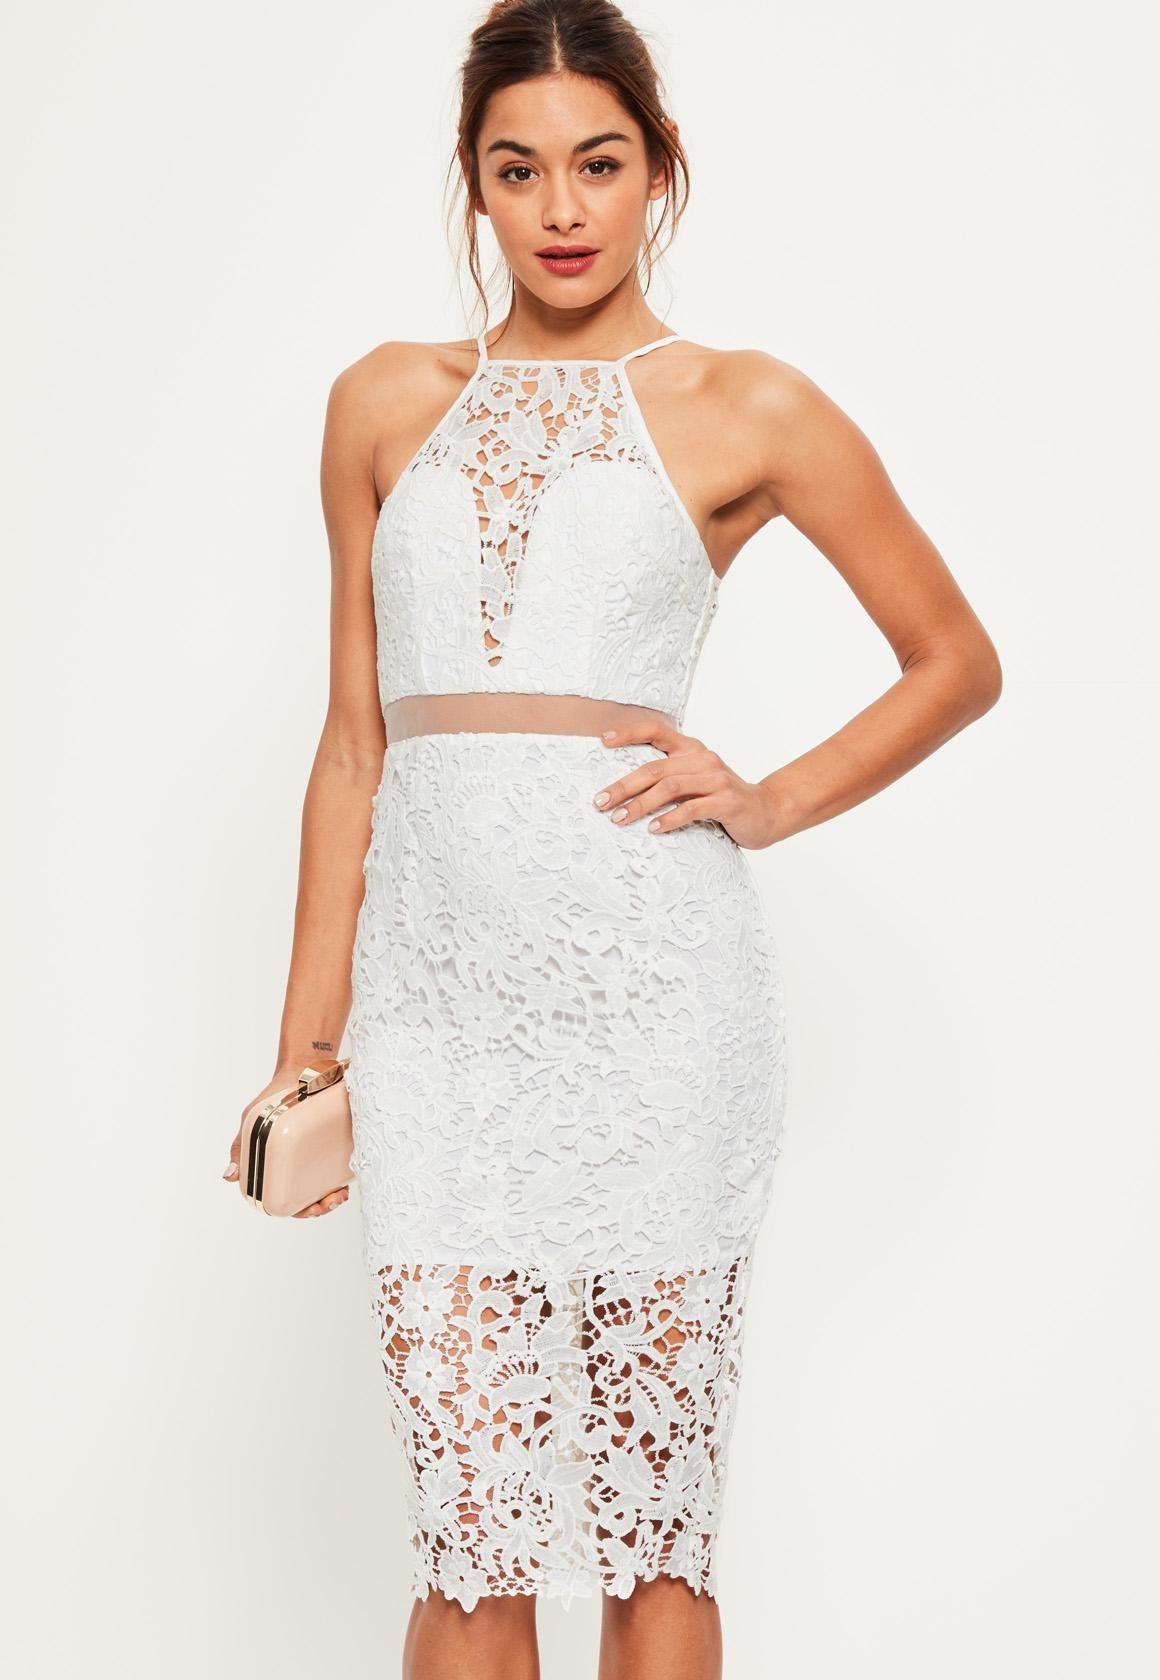 Missguided White Lace Strappy 2 Piece Midi Dress Midi Dress Women Dress Online Elegant Midi Dresses [ 1680 x 1160 Pixel ]